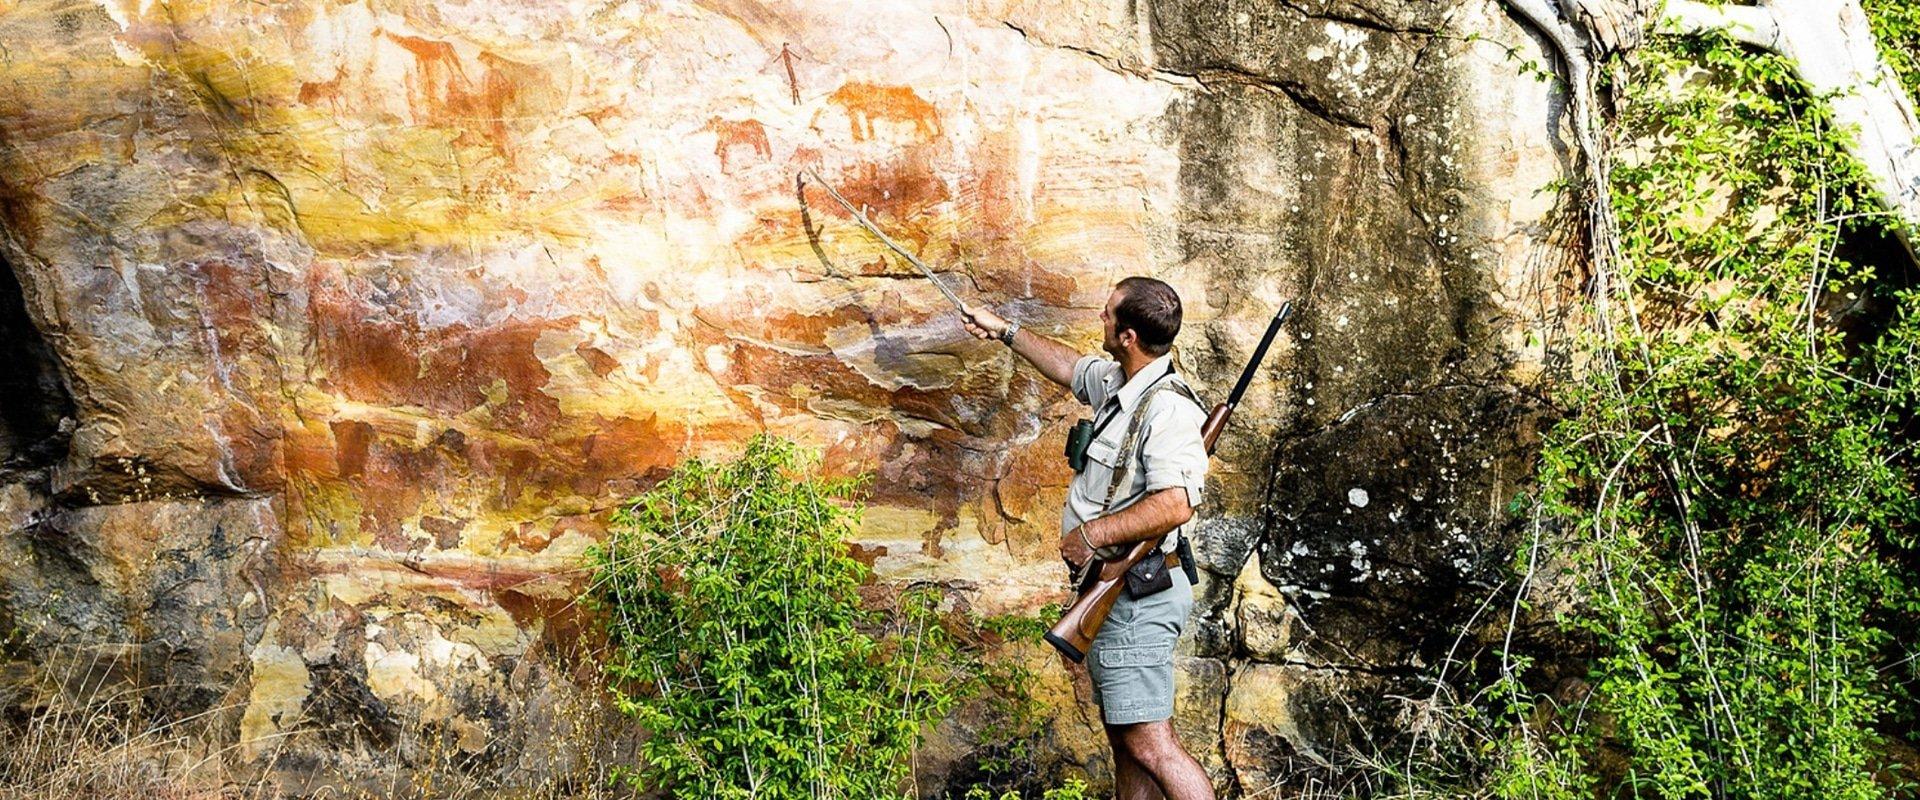 Visit the rich selection of San bushman rock art sites